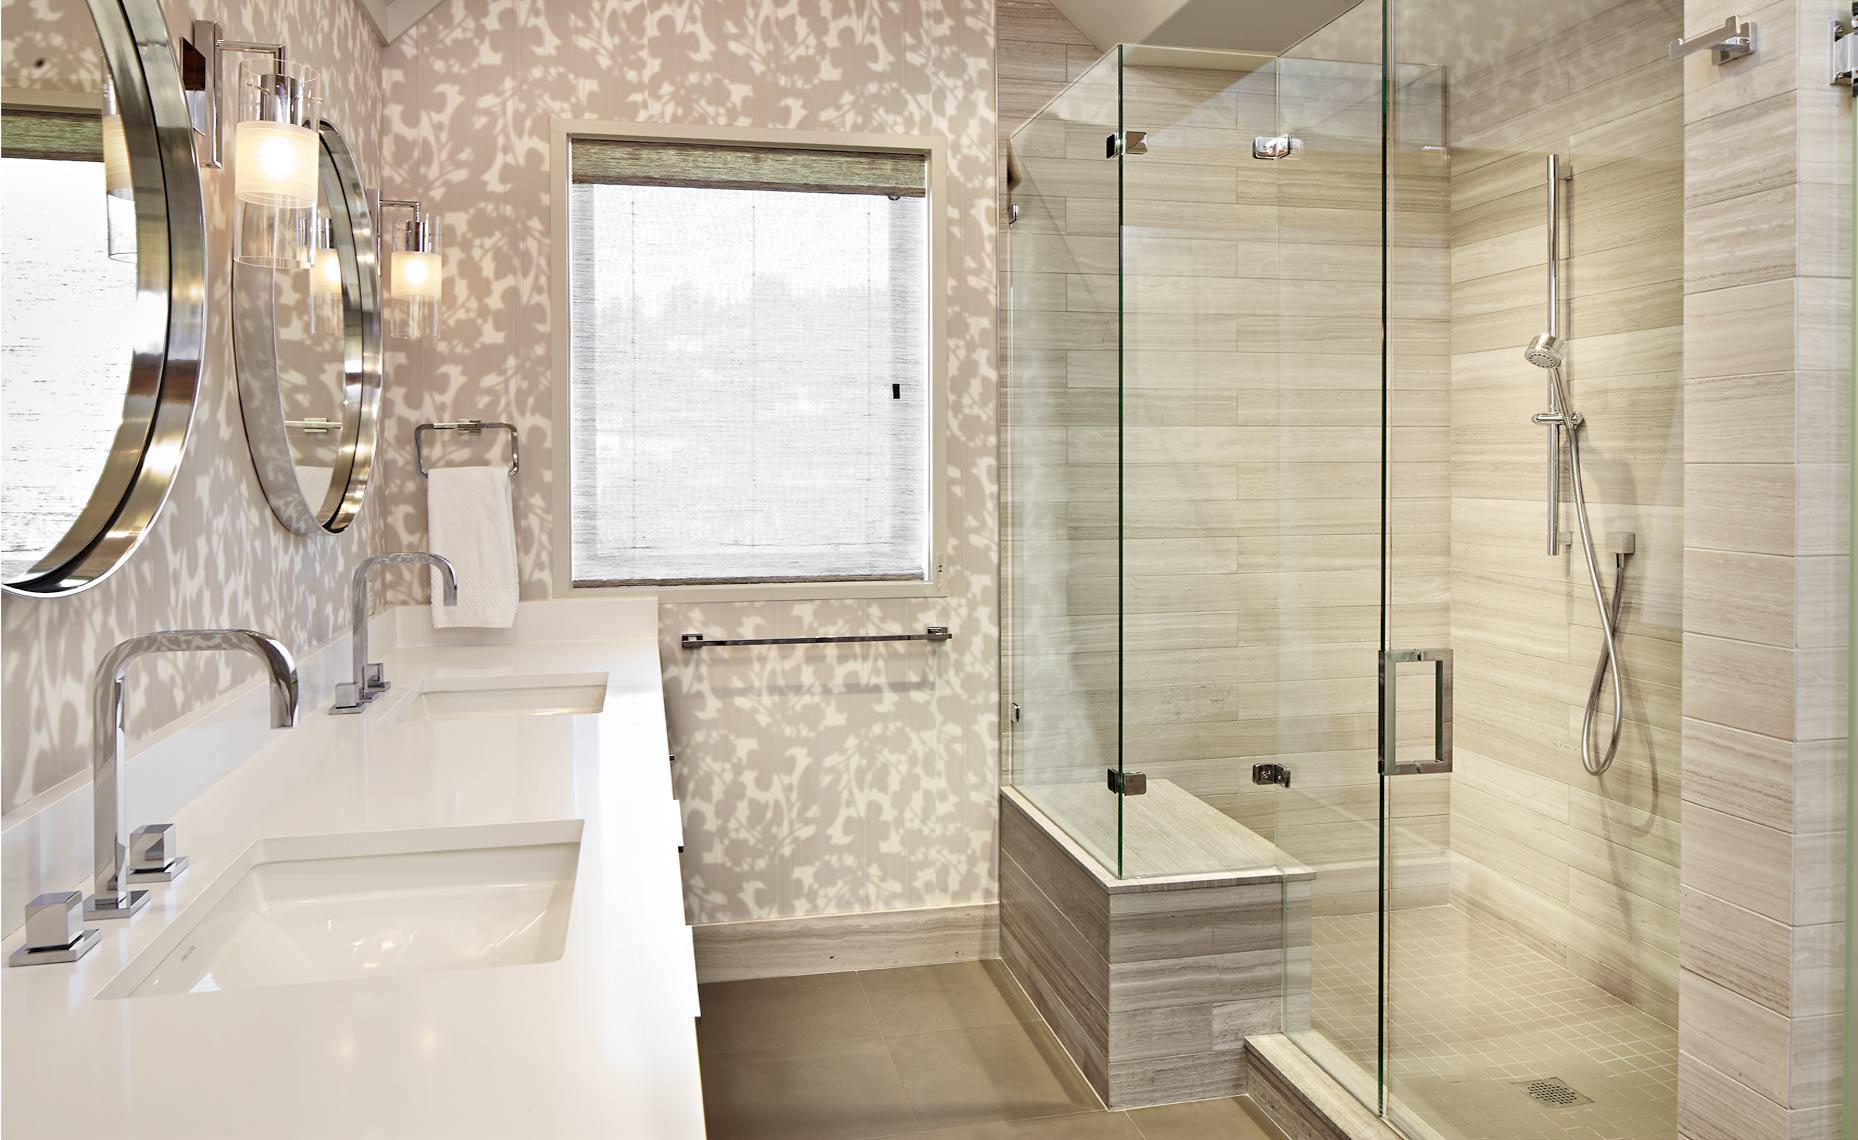 Burgess Pines Residence - Steamboat Springs, CO - Master Bathroom by LKID